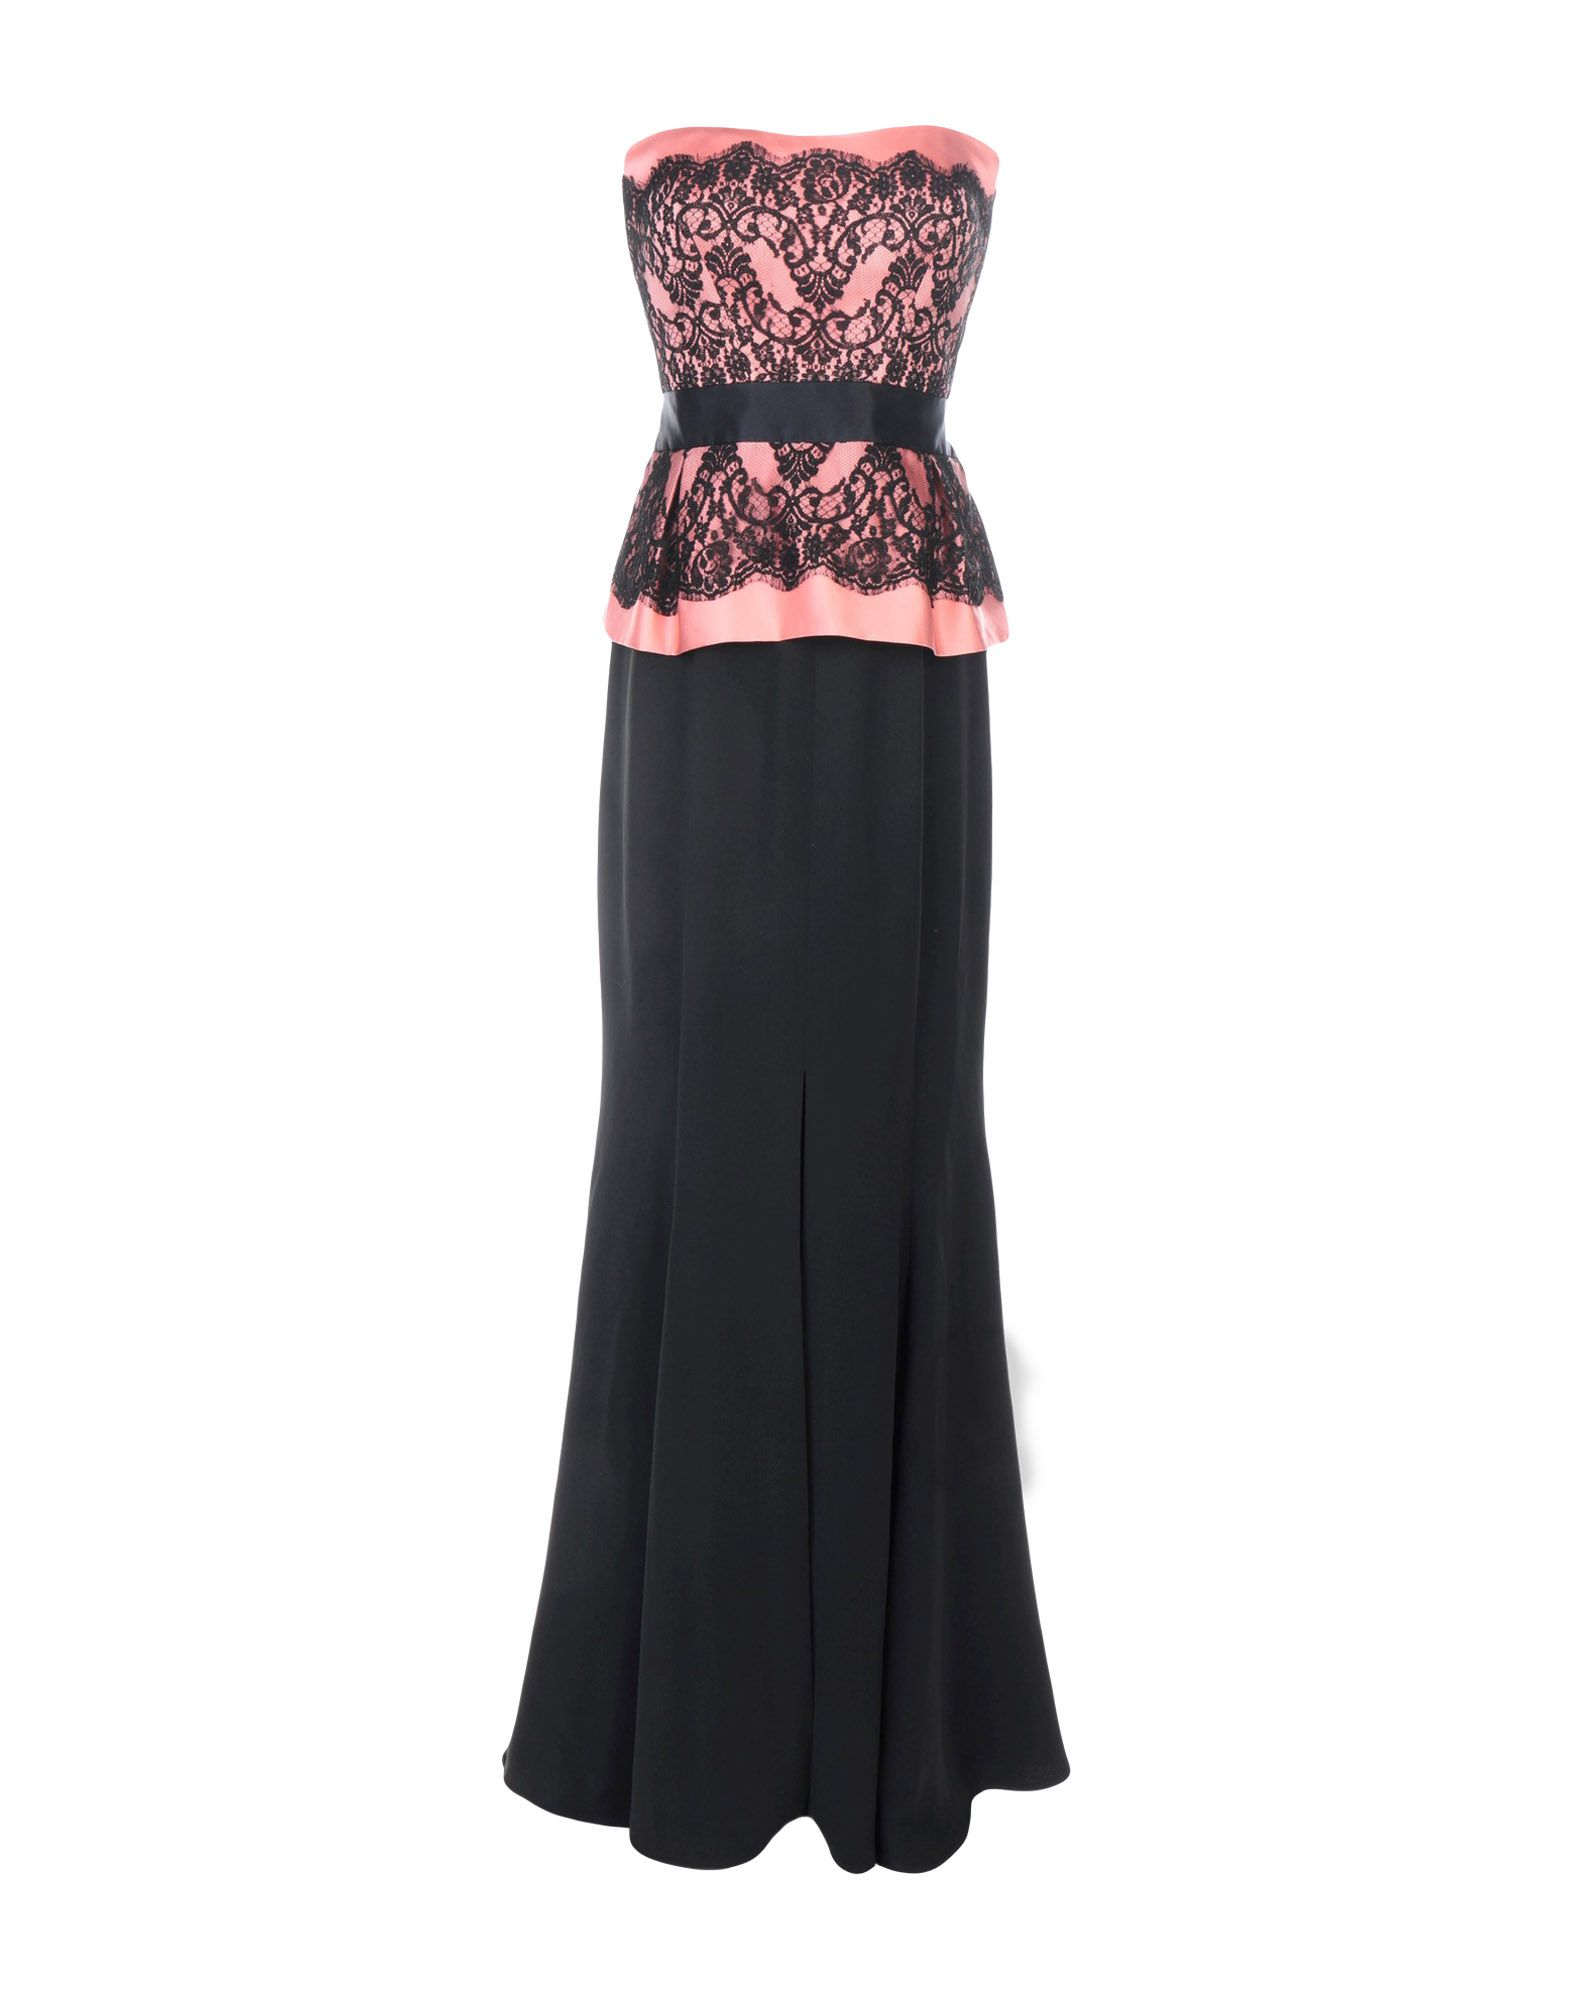 357f6f143d4f MAESTRI - Γυναικεία Φορέματα